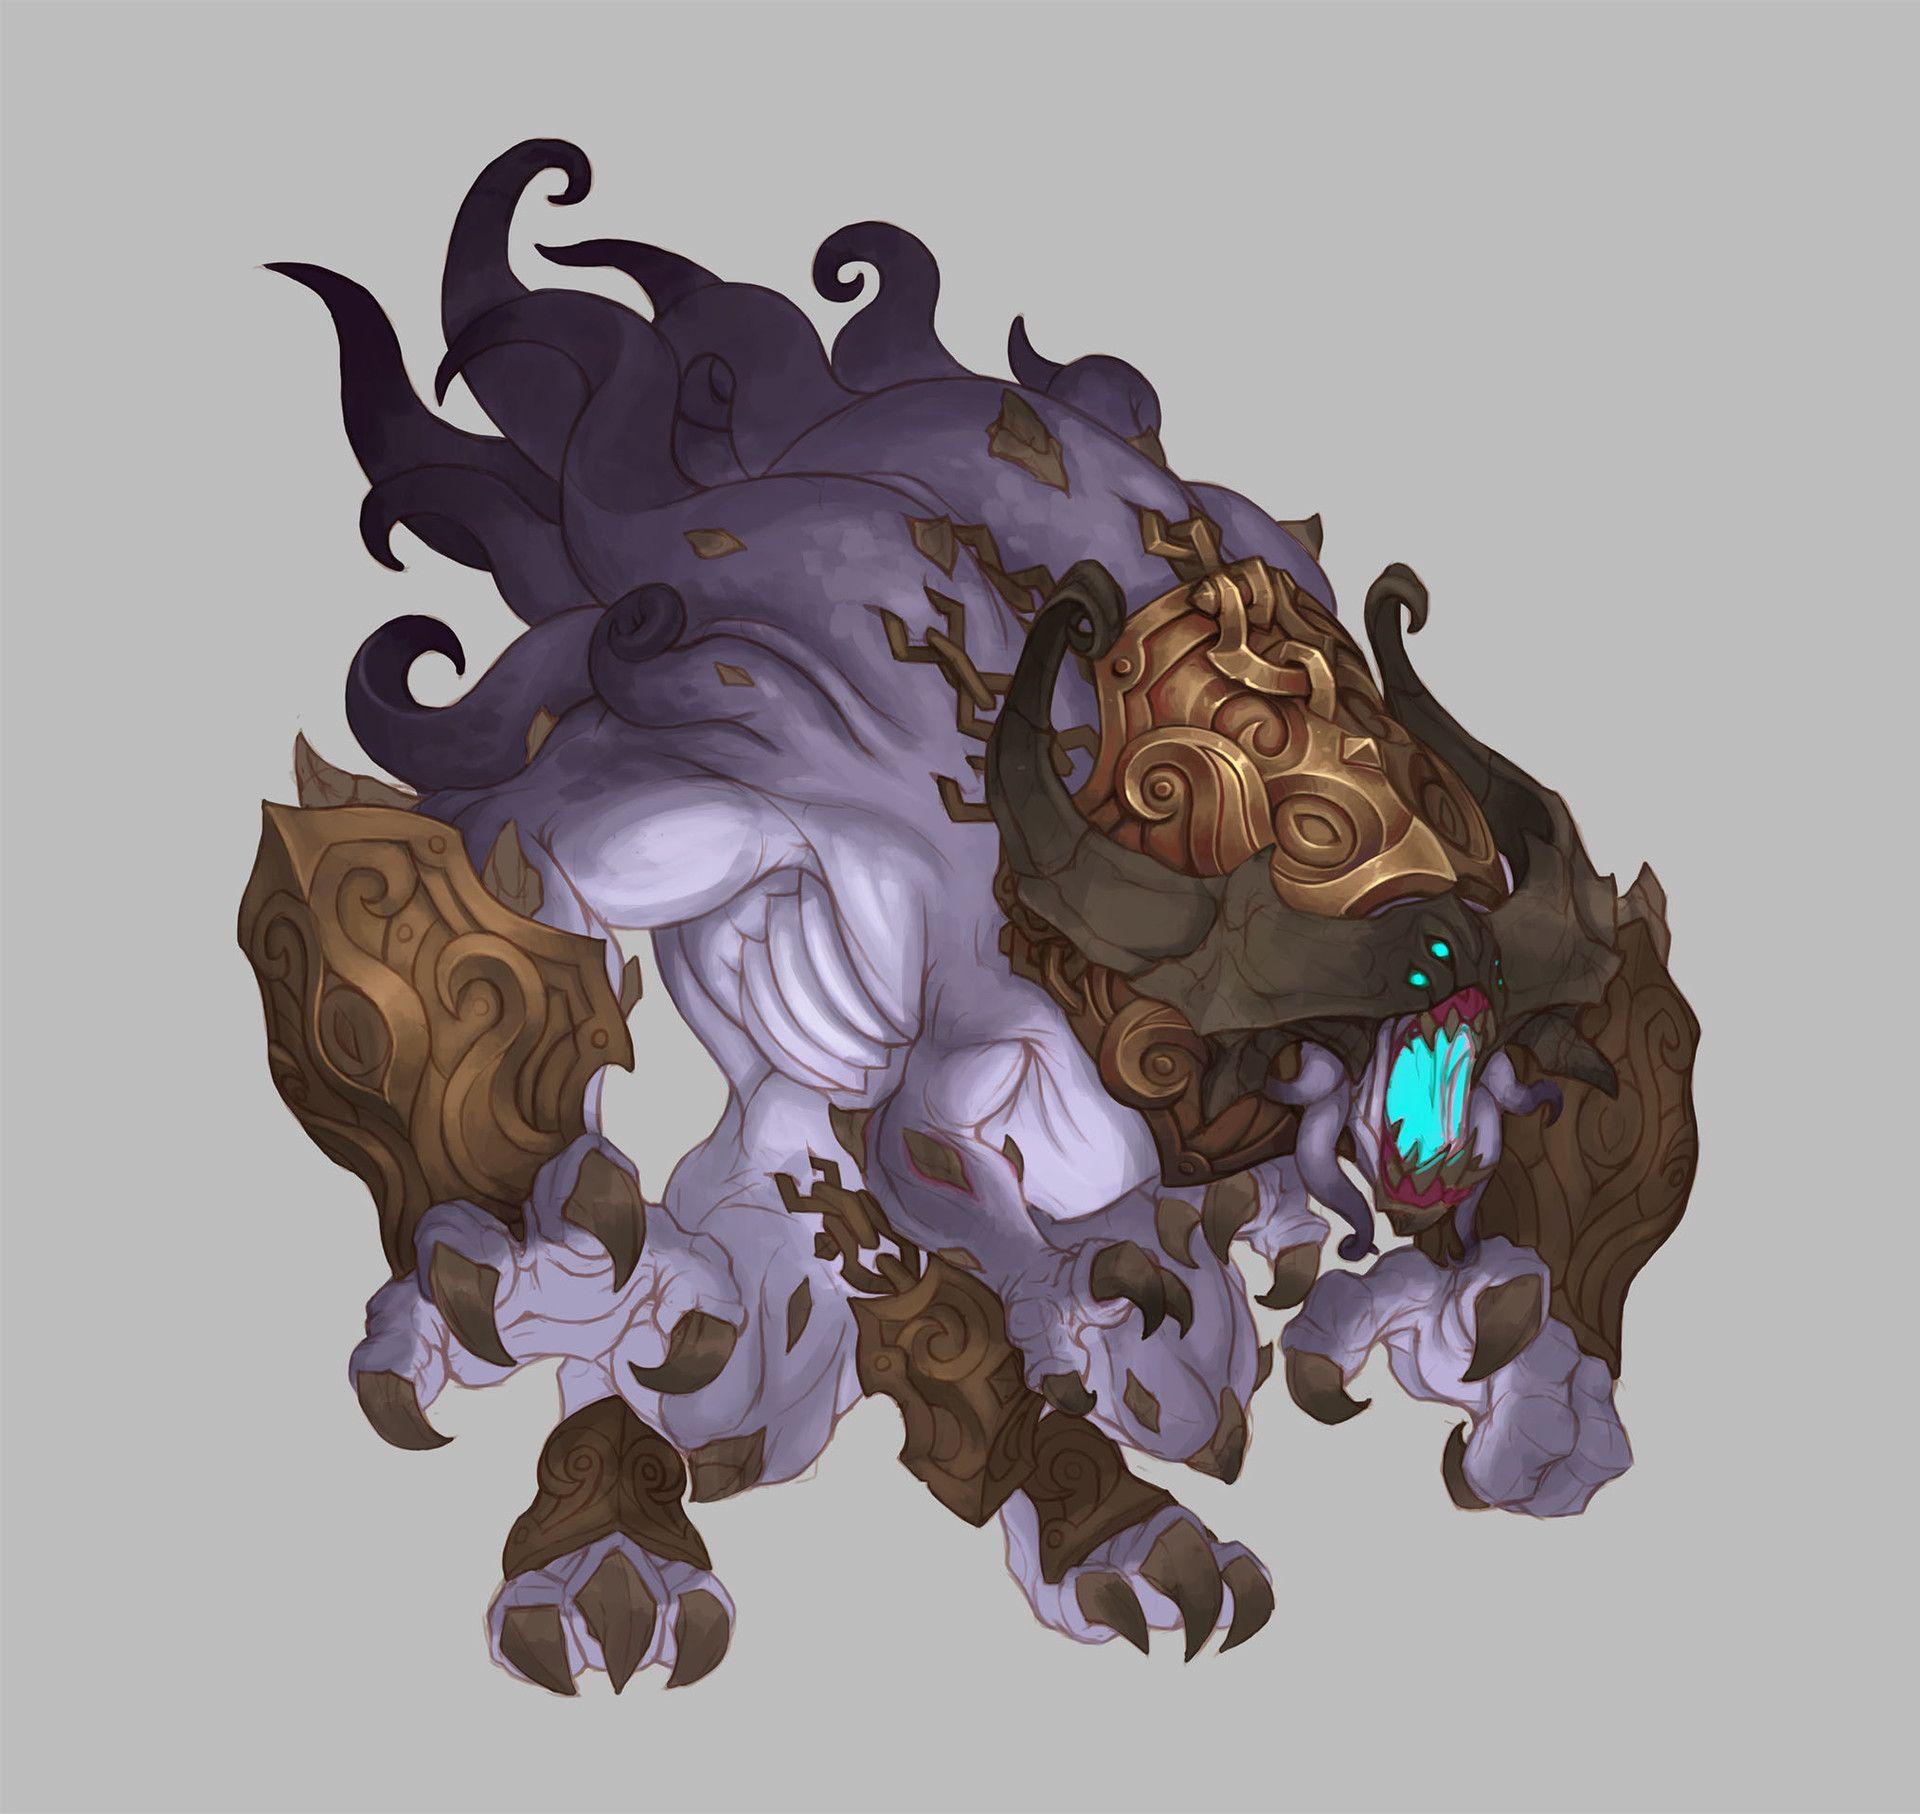 ArtStation - Monsters - Torchlight 2, Kyle Cornelius